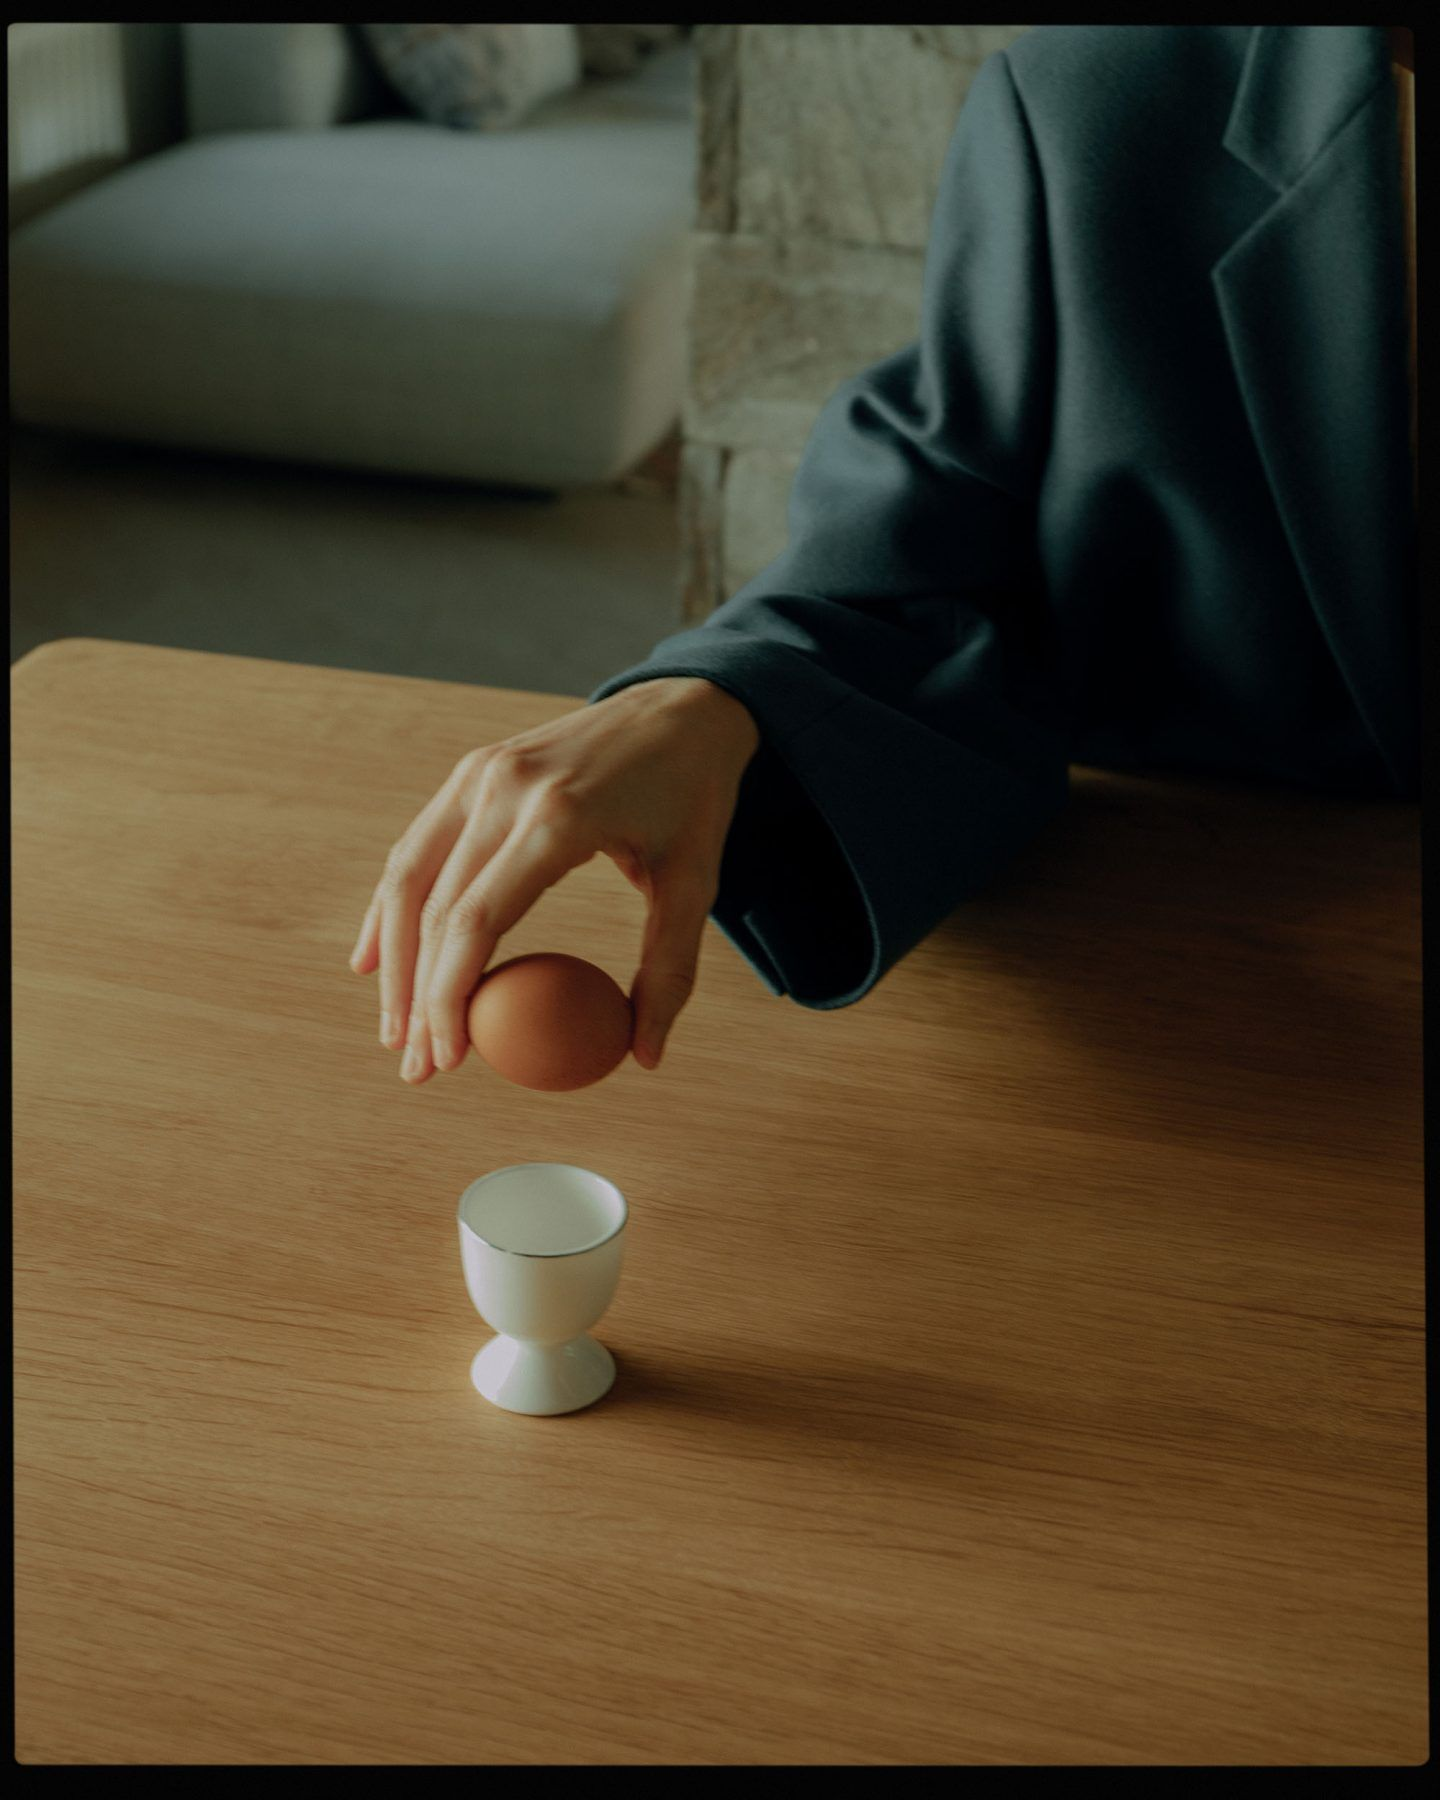 IGNANT-Photography-Daniel-Garzee-010